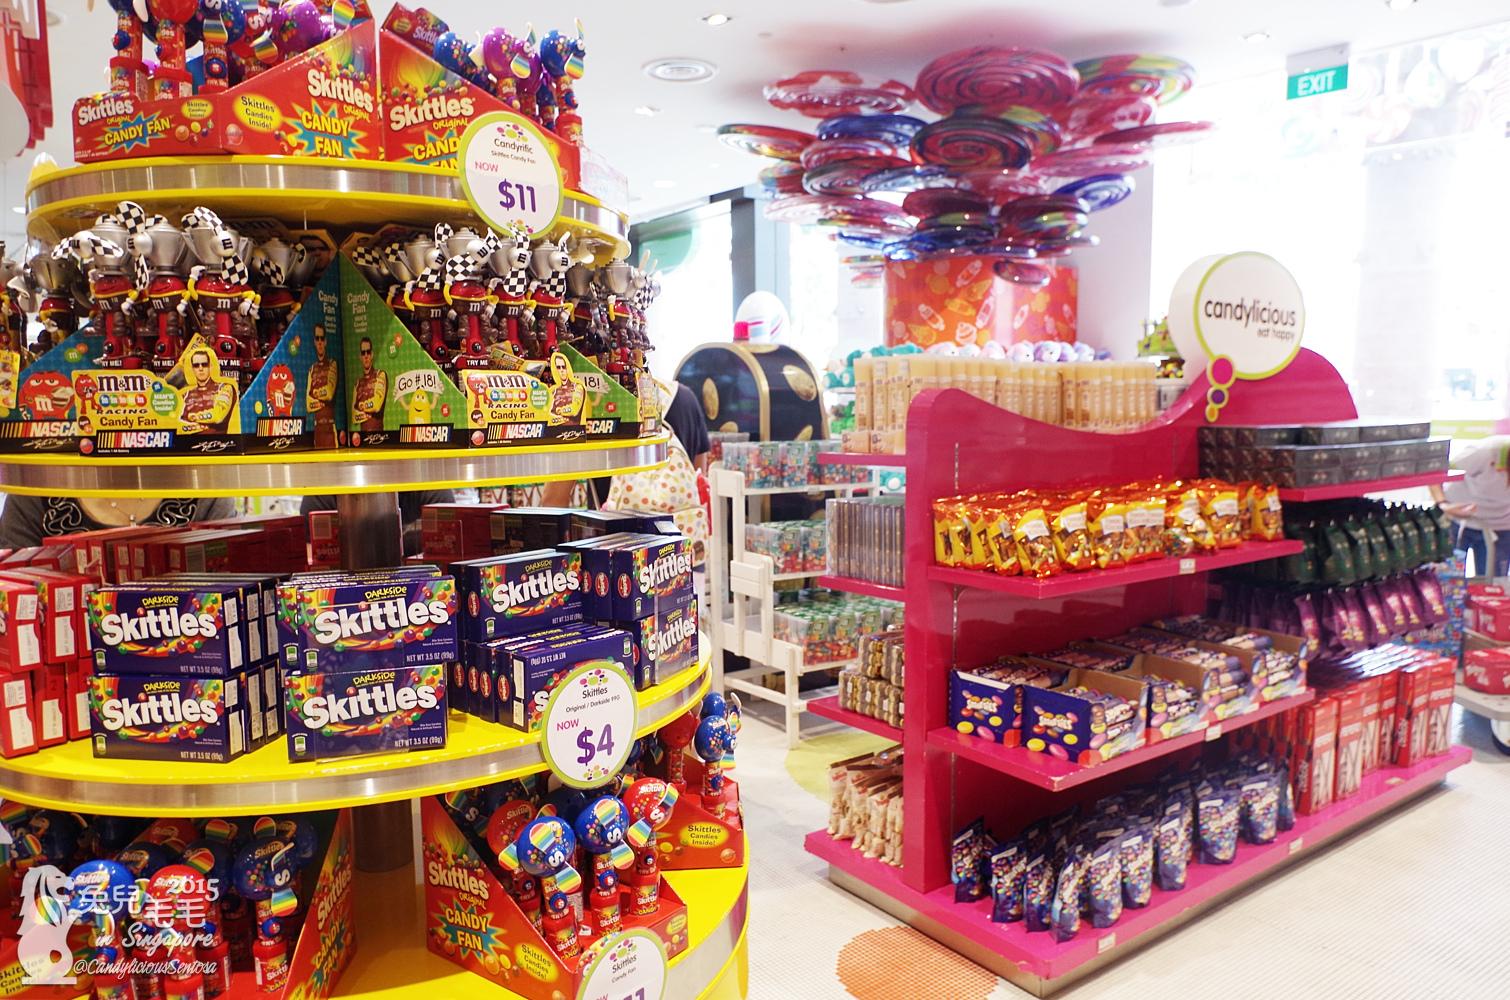 0215-Candylicious-14.jpg